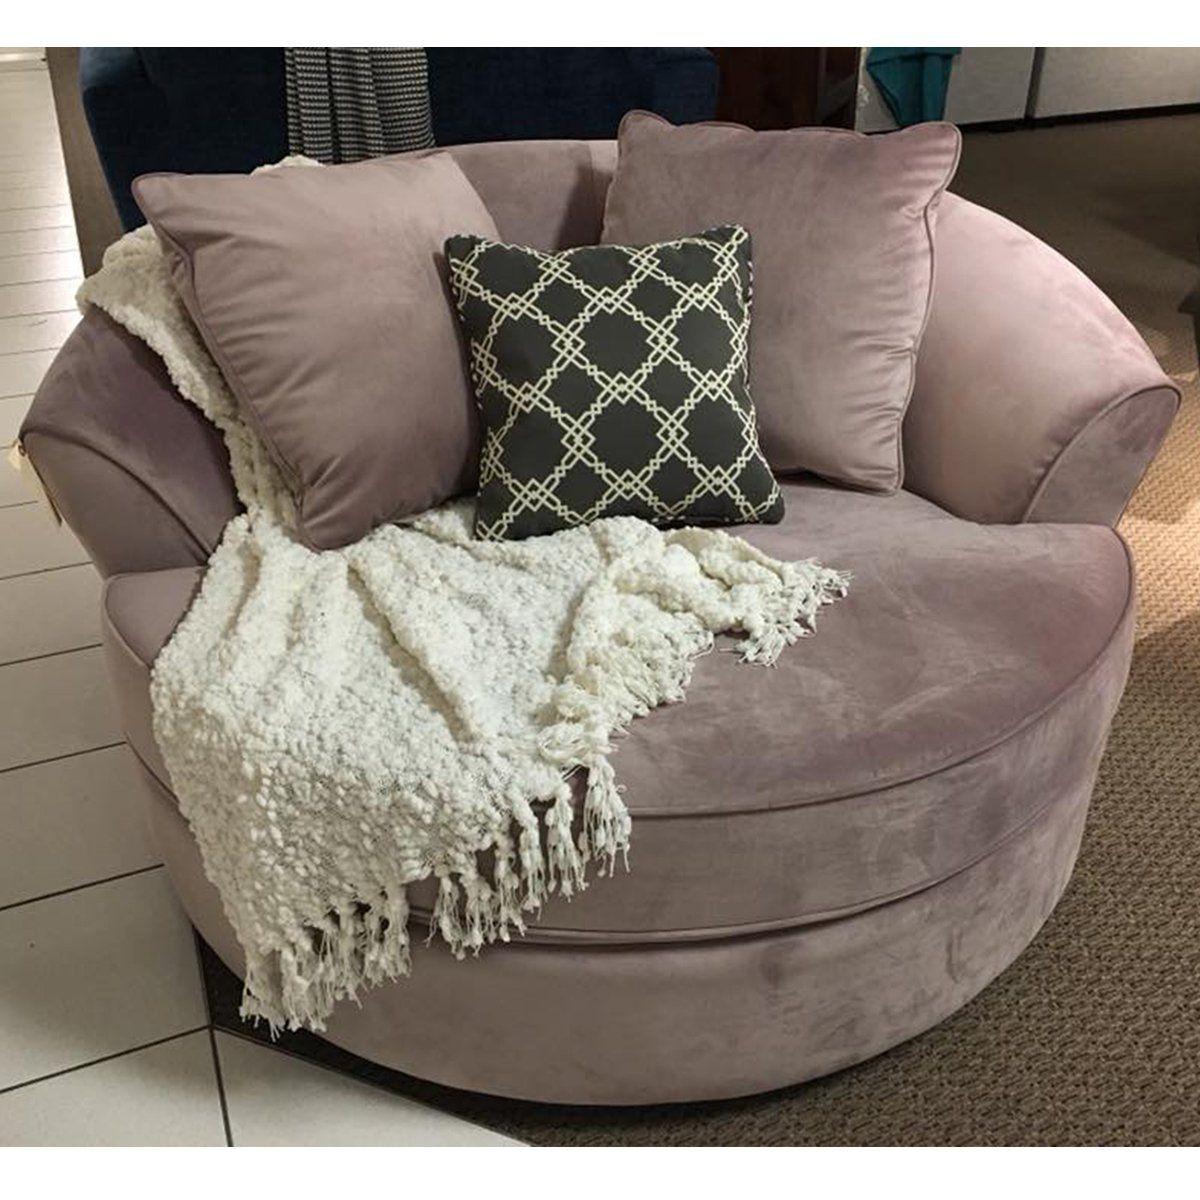 CUSTOM NEST CHAIR MADE IN CANADA - Blush $13  Nest chair